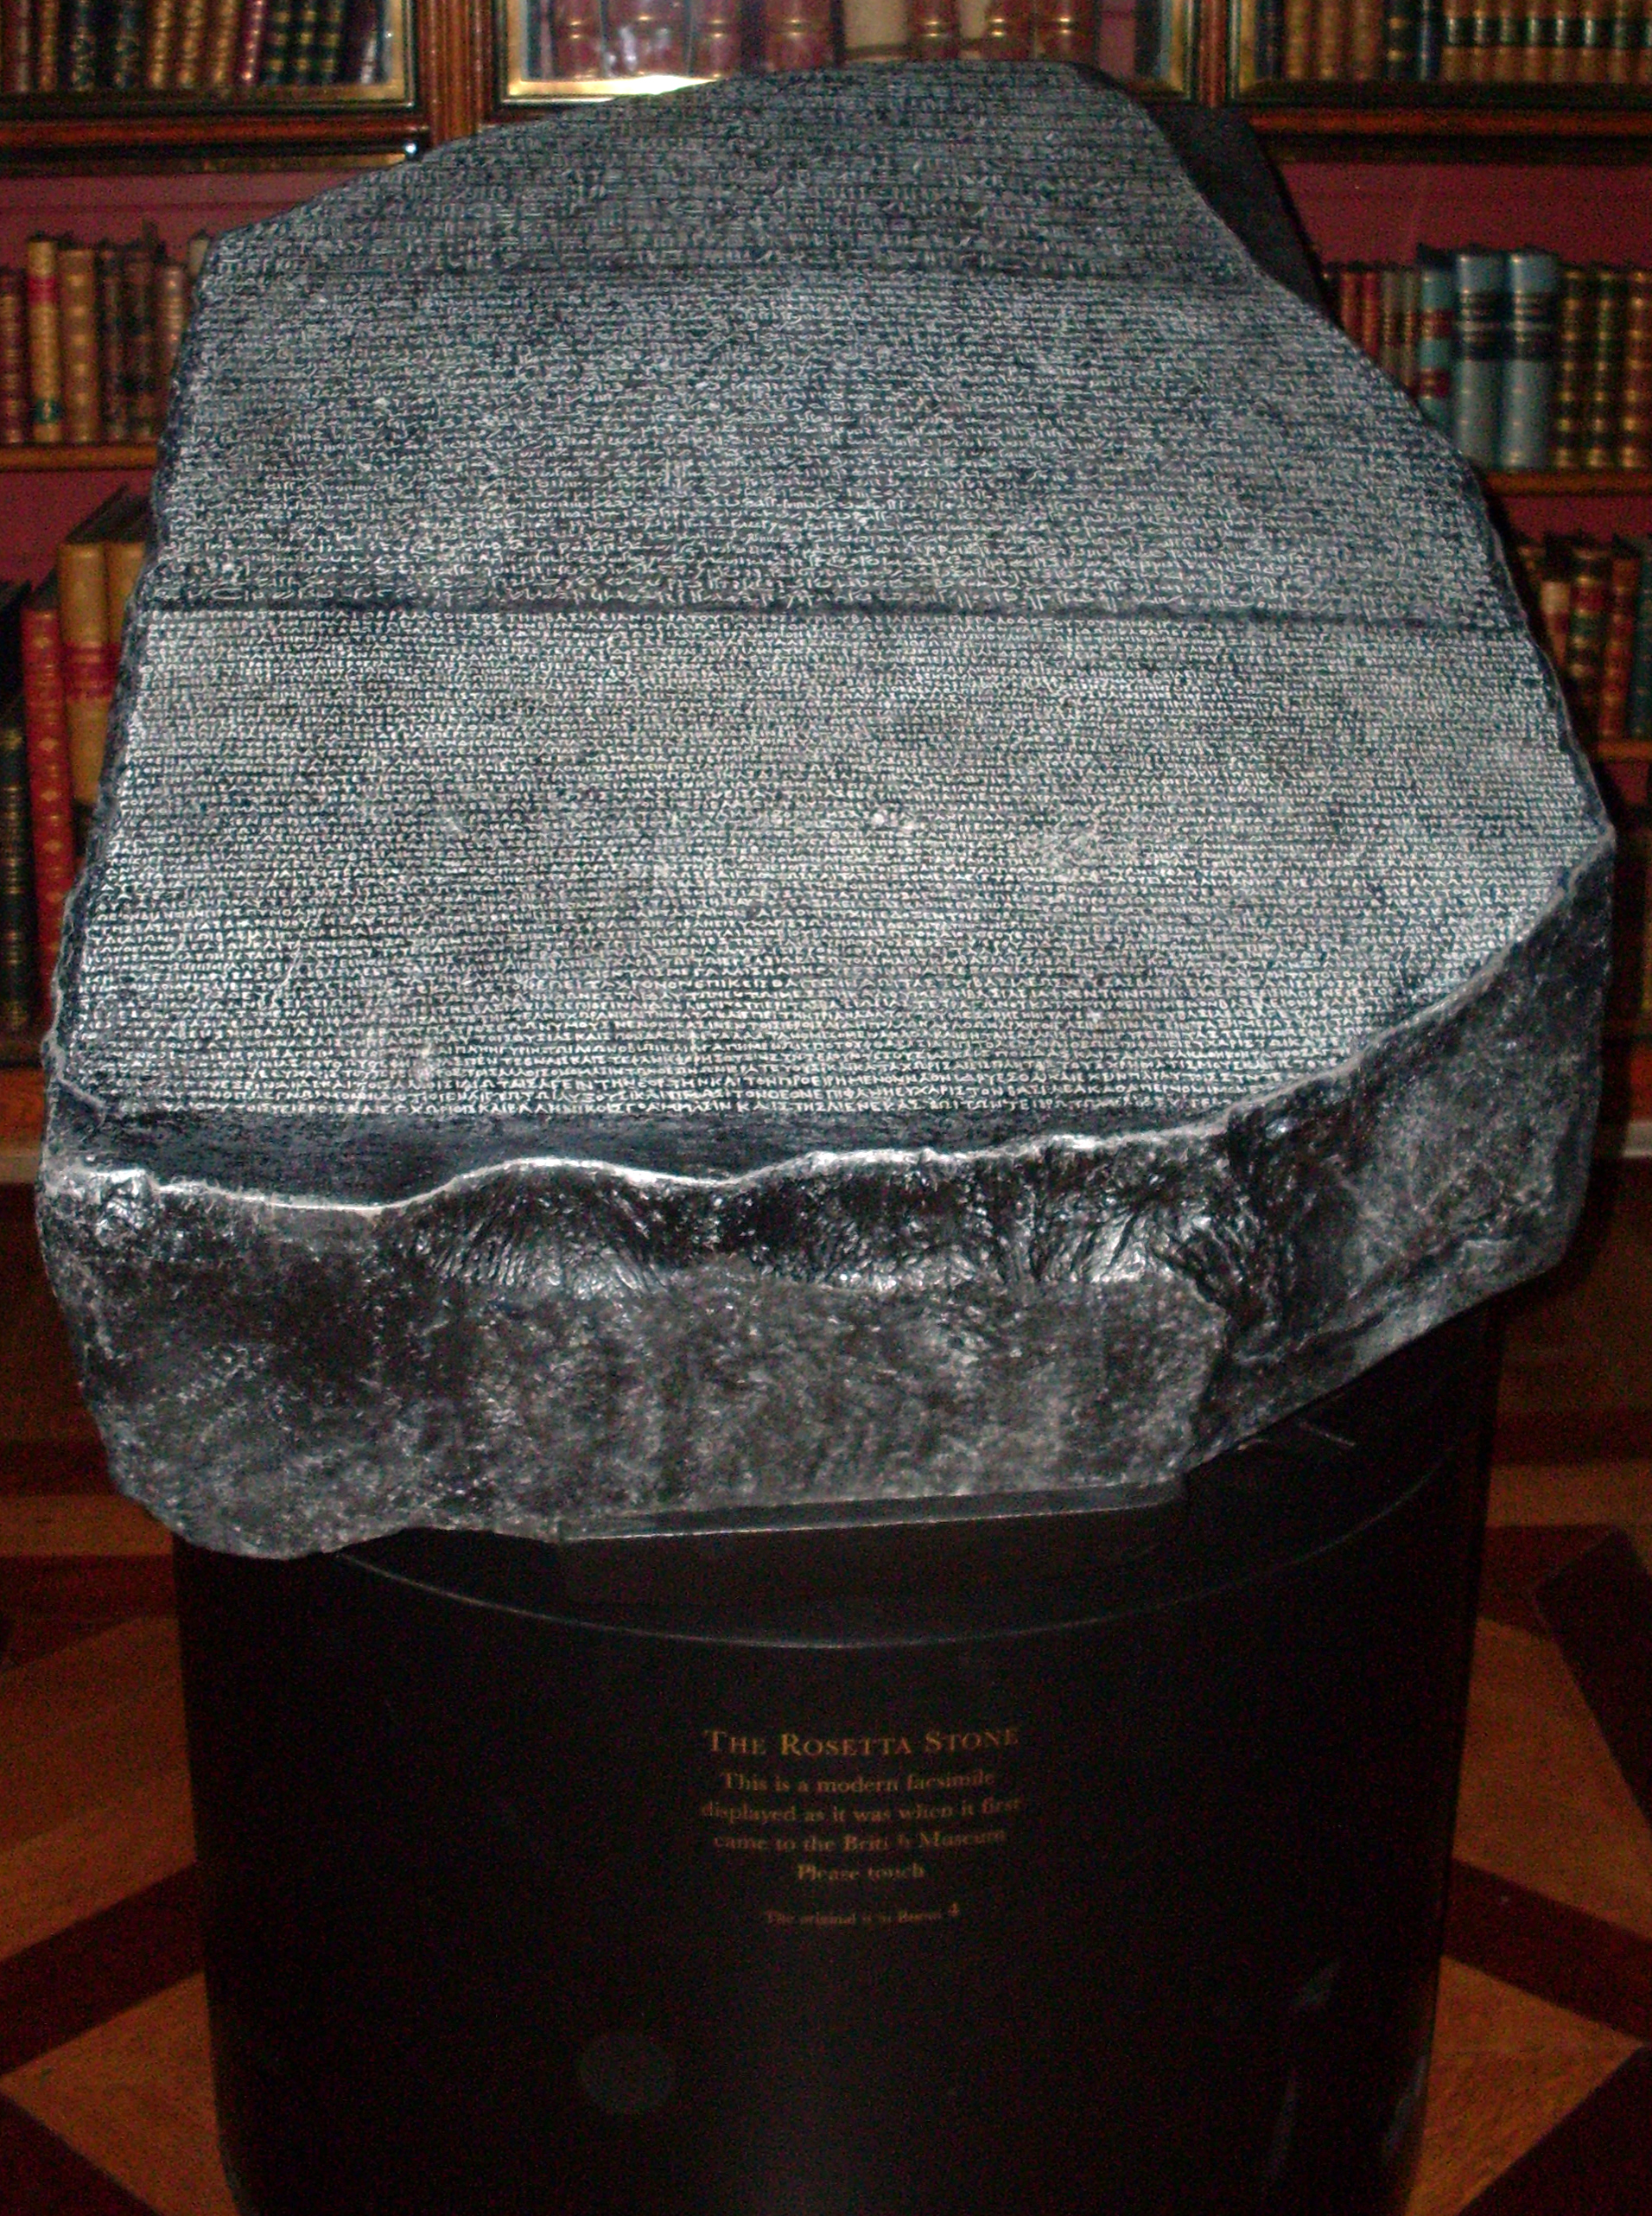 Rosetta Stone | Andrew Dalby - Academia.edu